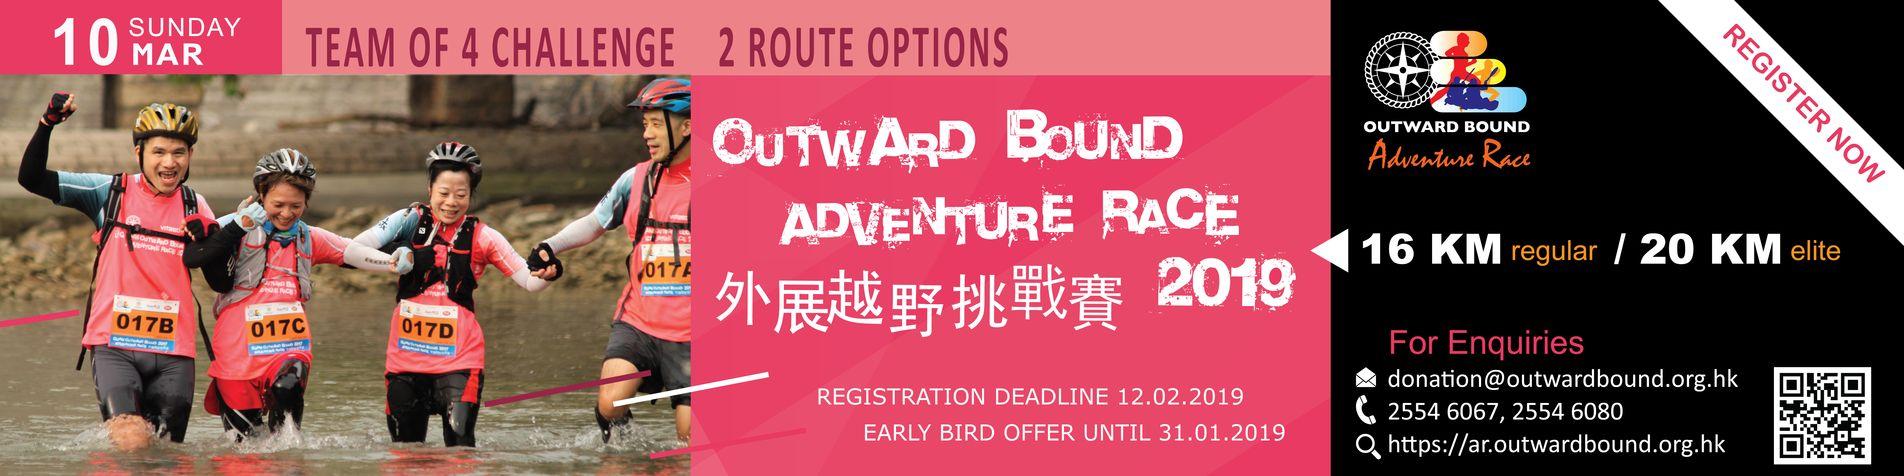 Outward Bound Adventure Race 2019